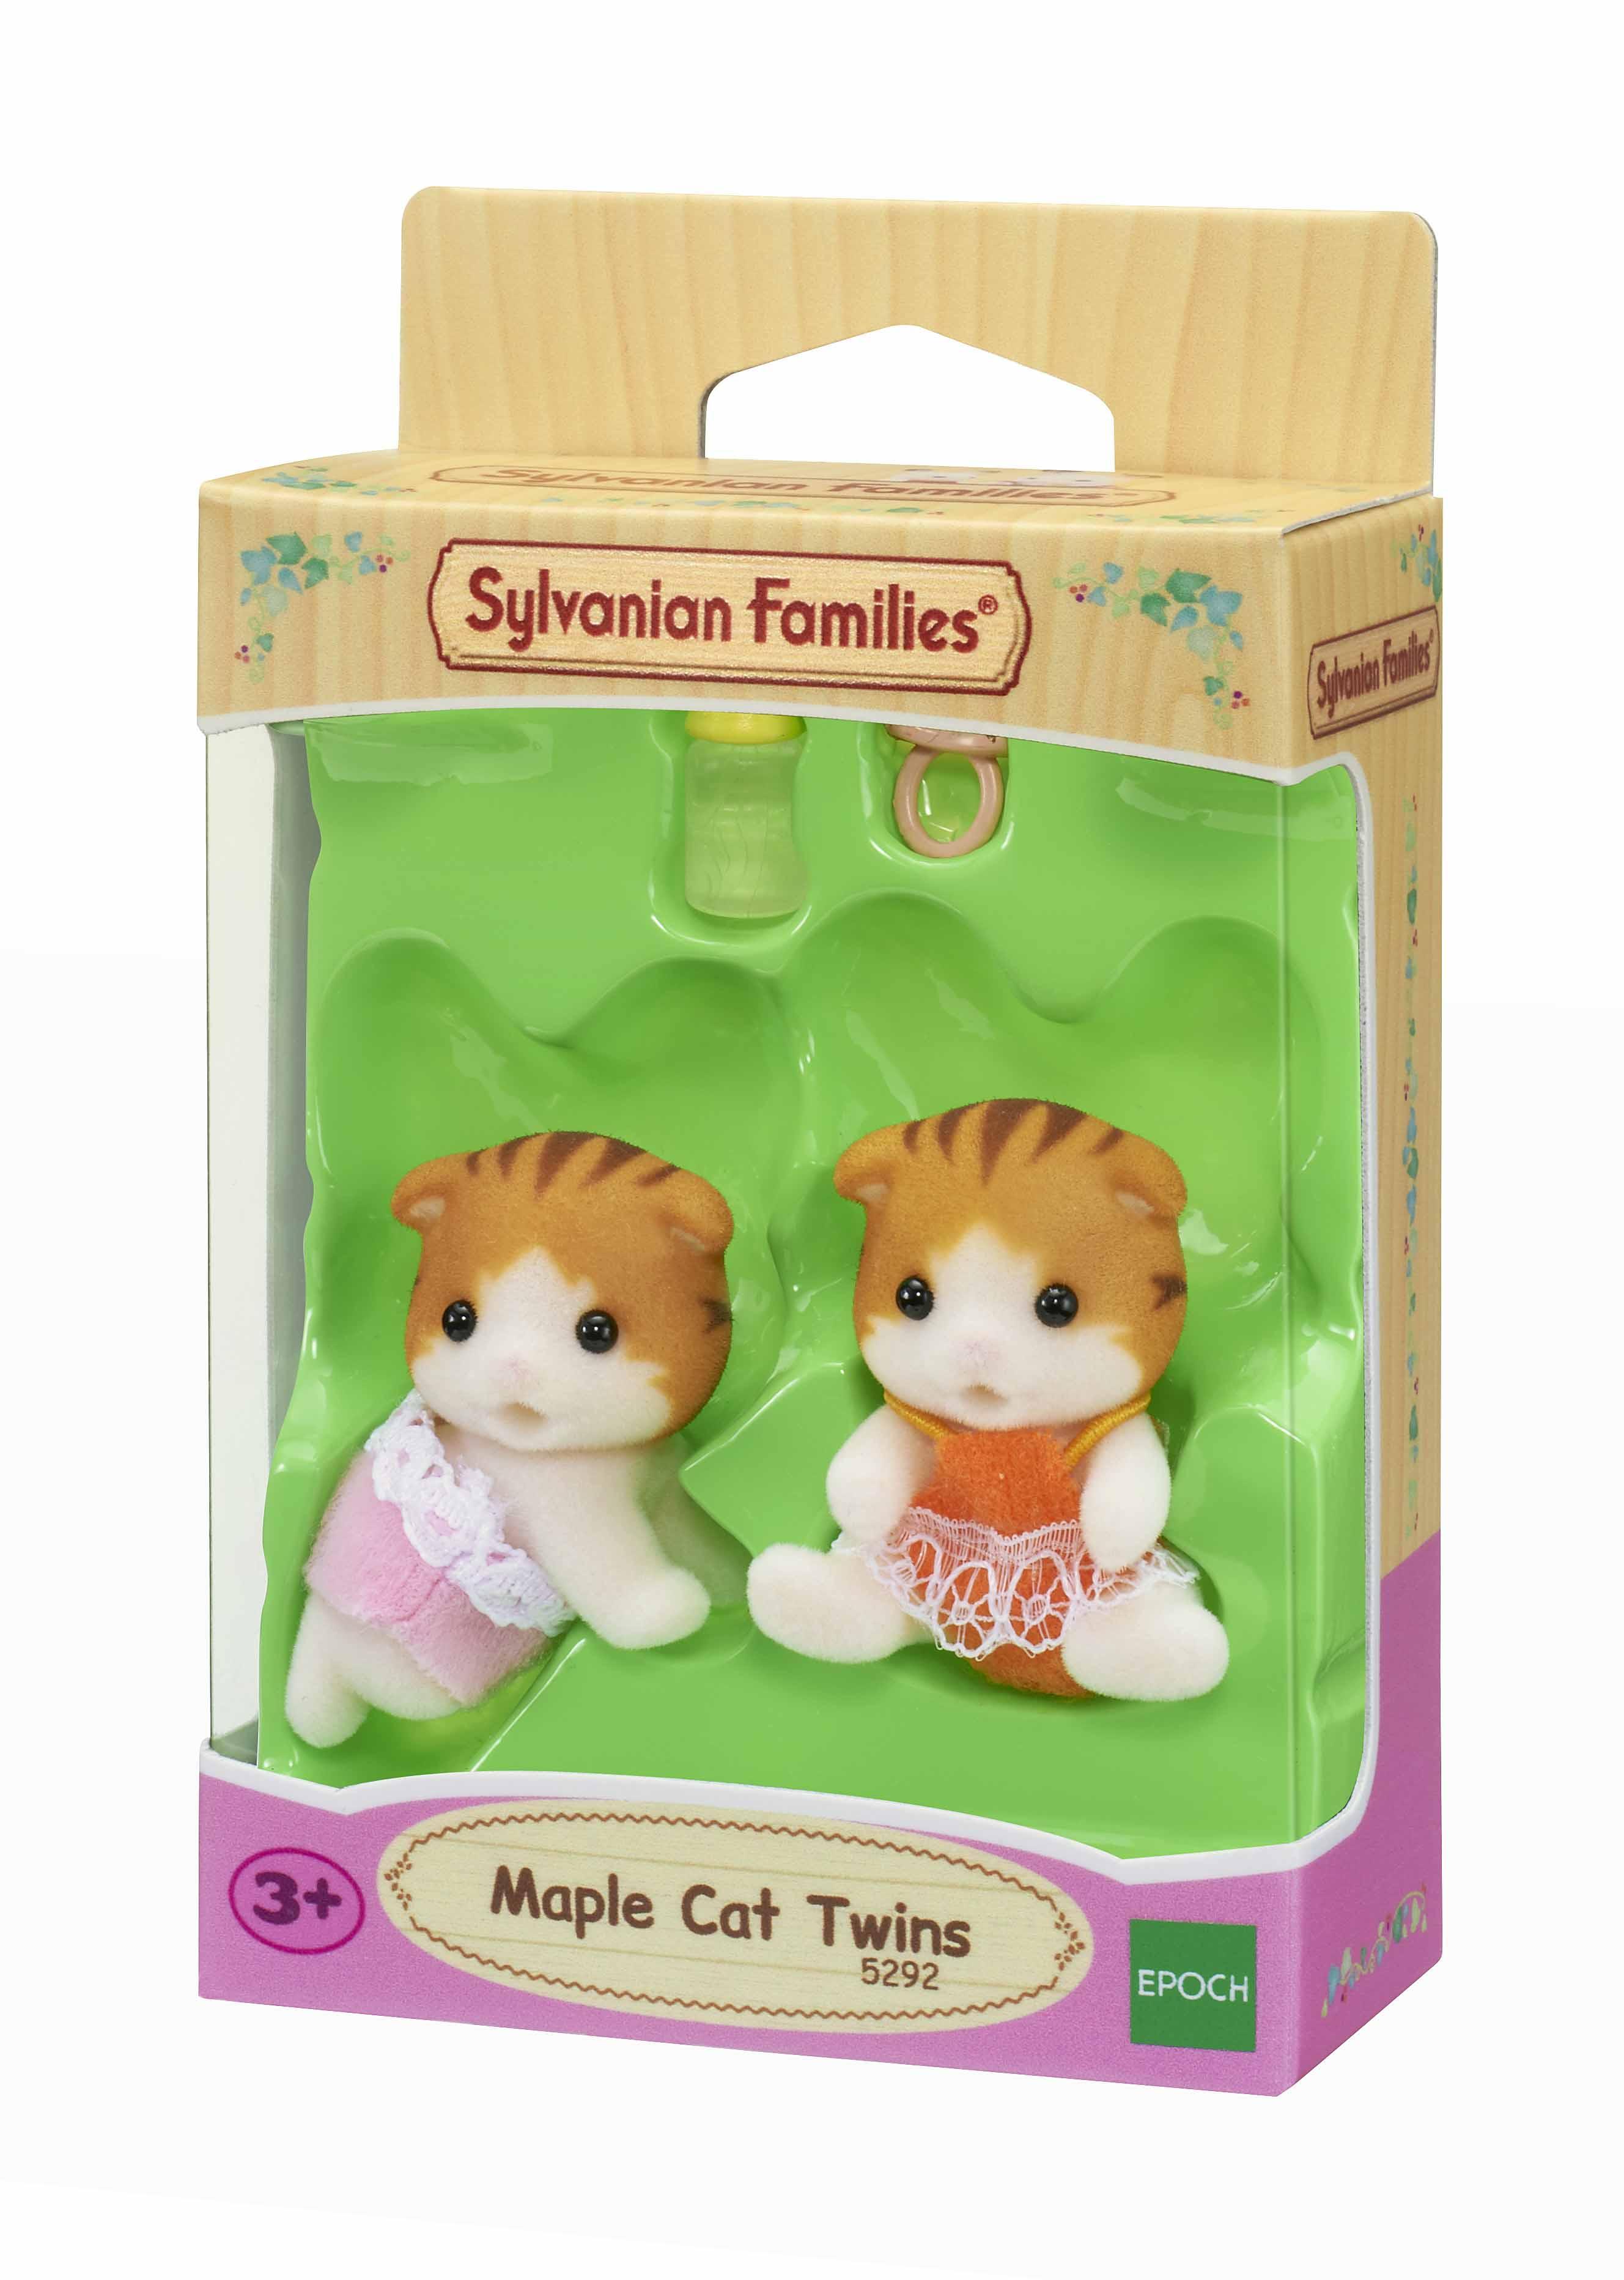 Sylvanian families – gemelli gatti - SYLVANIAN FAMILIES